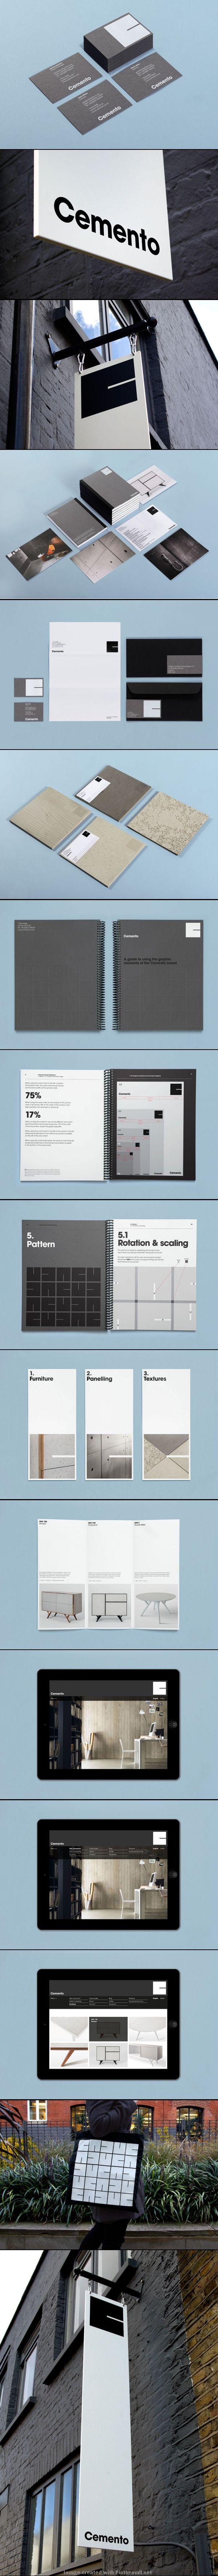 Cemento   #stationary #corporate #design #corporatedesign #identity #branding #marketing < repinned by www.BlickeDeeler.de   Visit our website: www.blickedeeler.de/leistungen/corporate-design